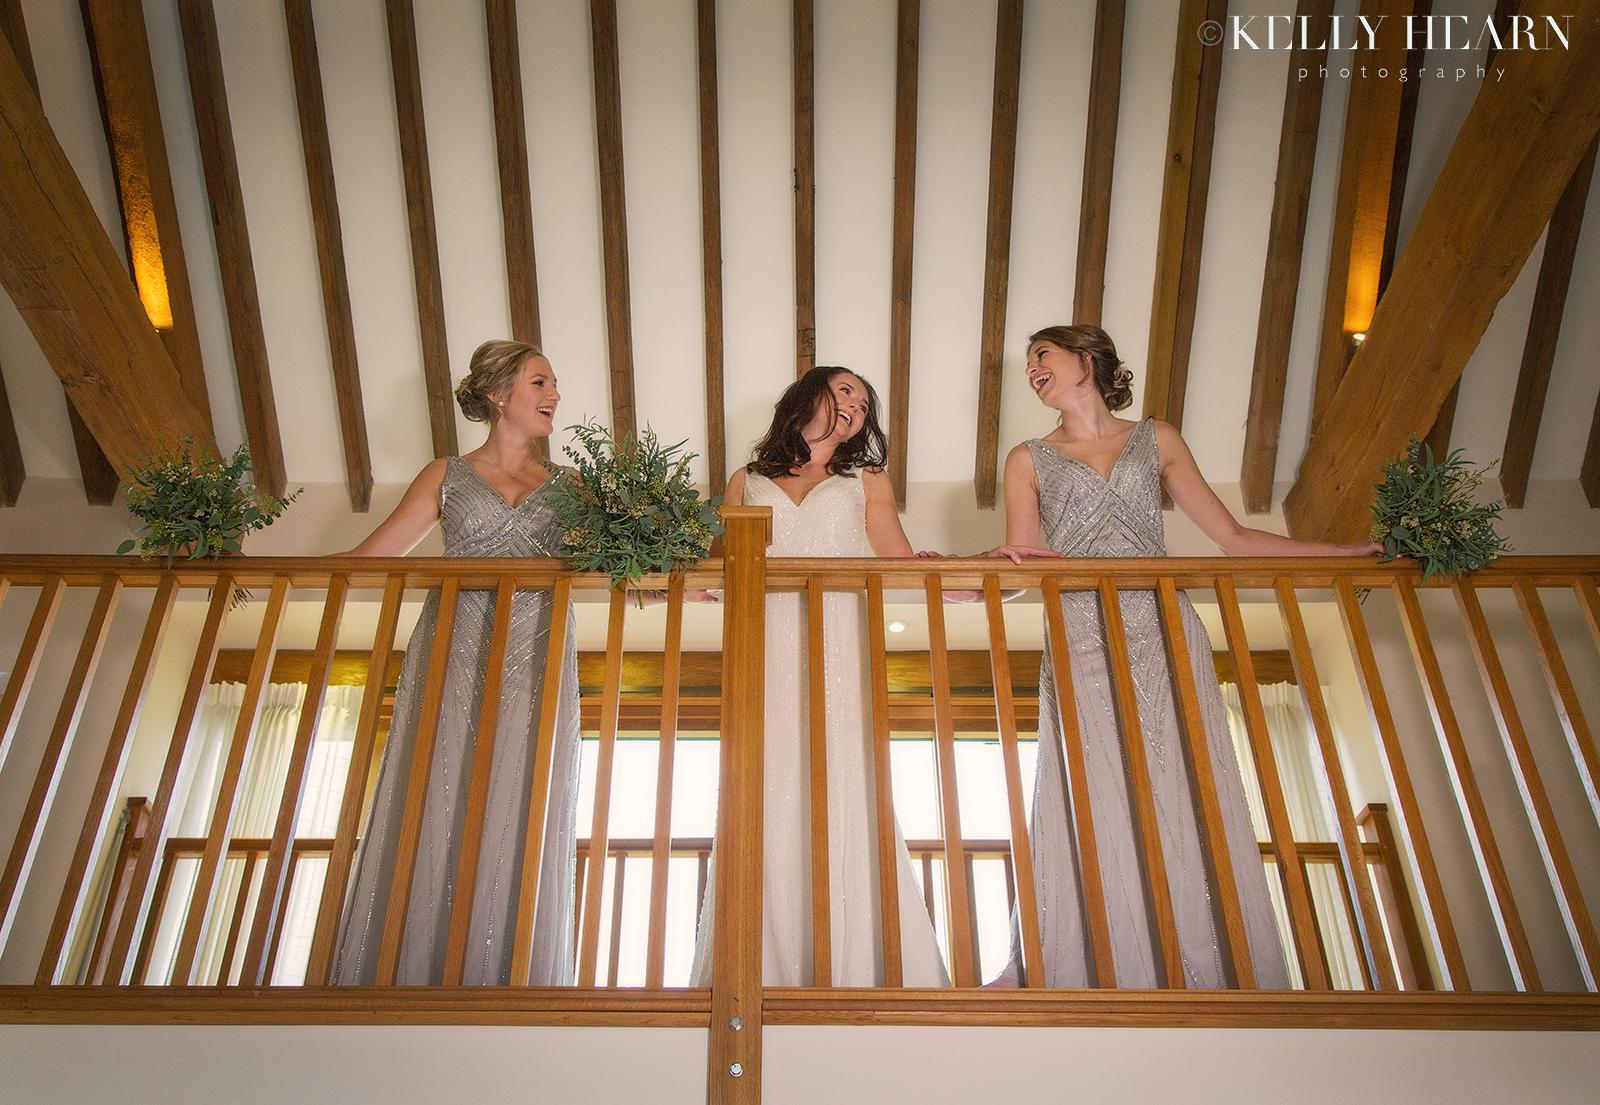 SPR_bride-bridesmaids-balcony.jpg#asset:1989